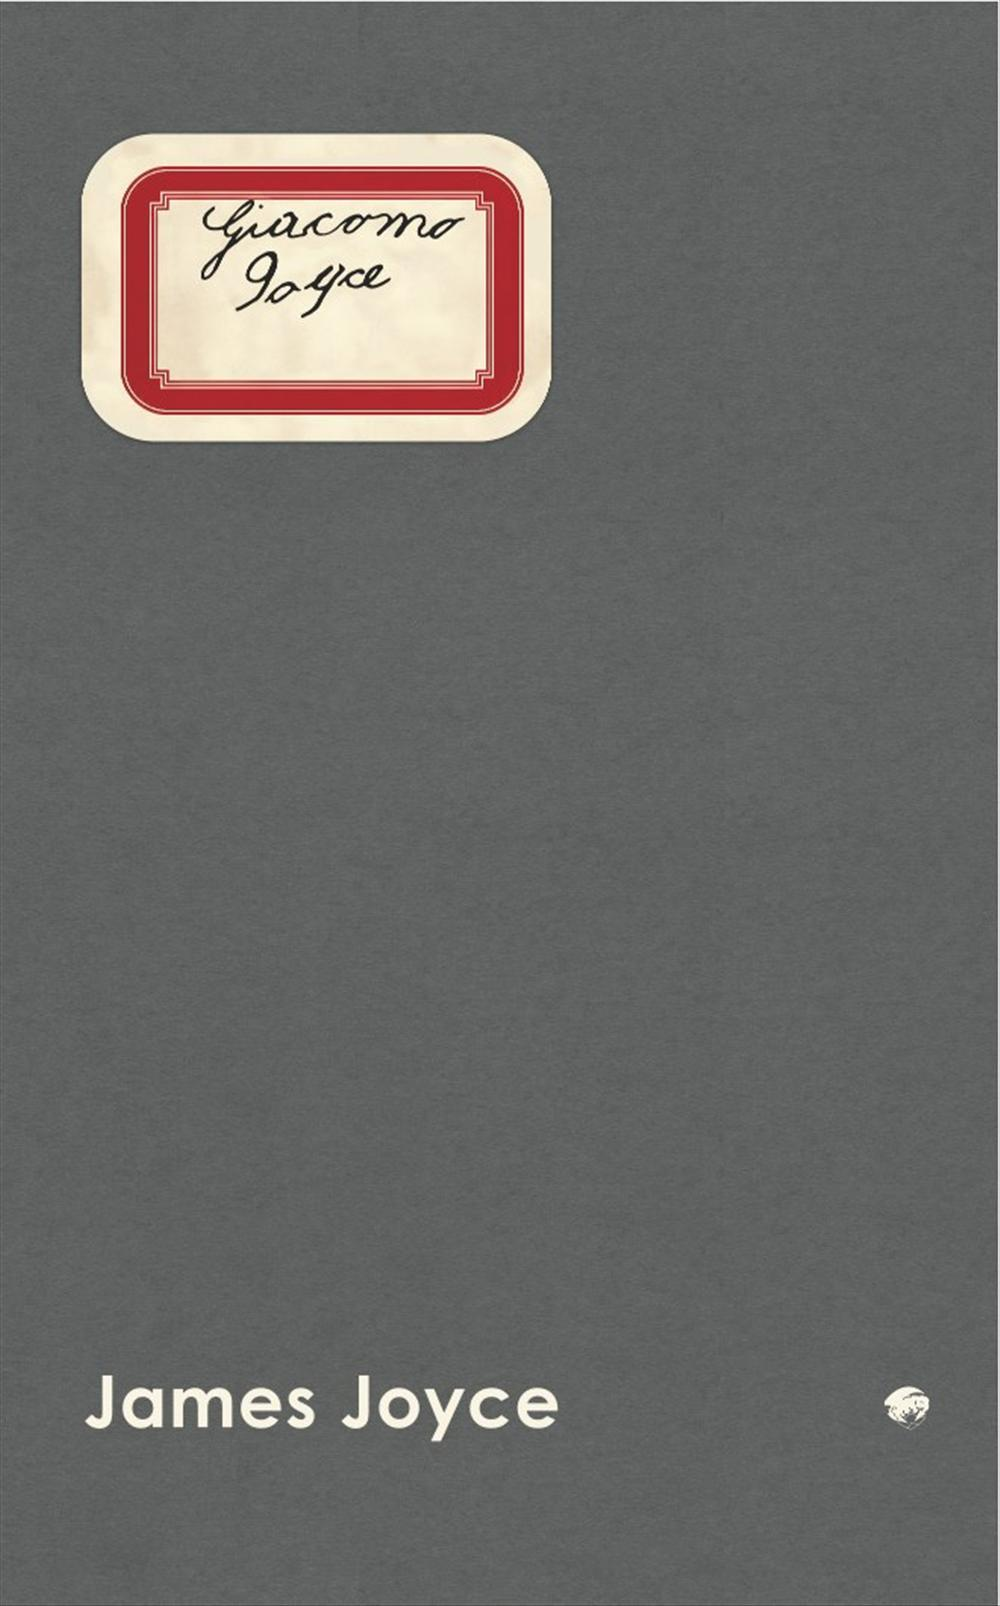 Basilisk Babel: Giacomo Joyce - James Joyce - Bøger - Forlaget Basilisk - 9788791407987 - February 19, 2016